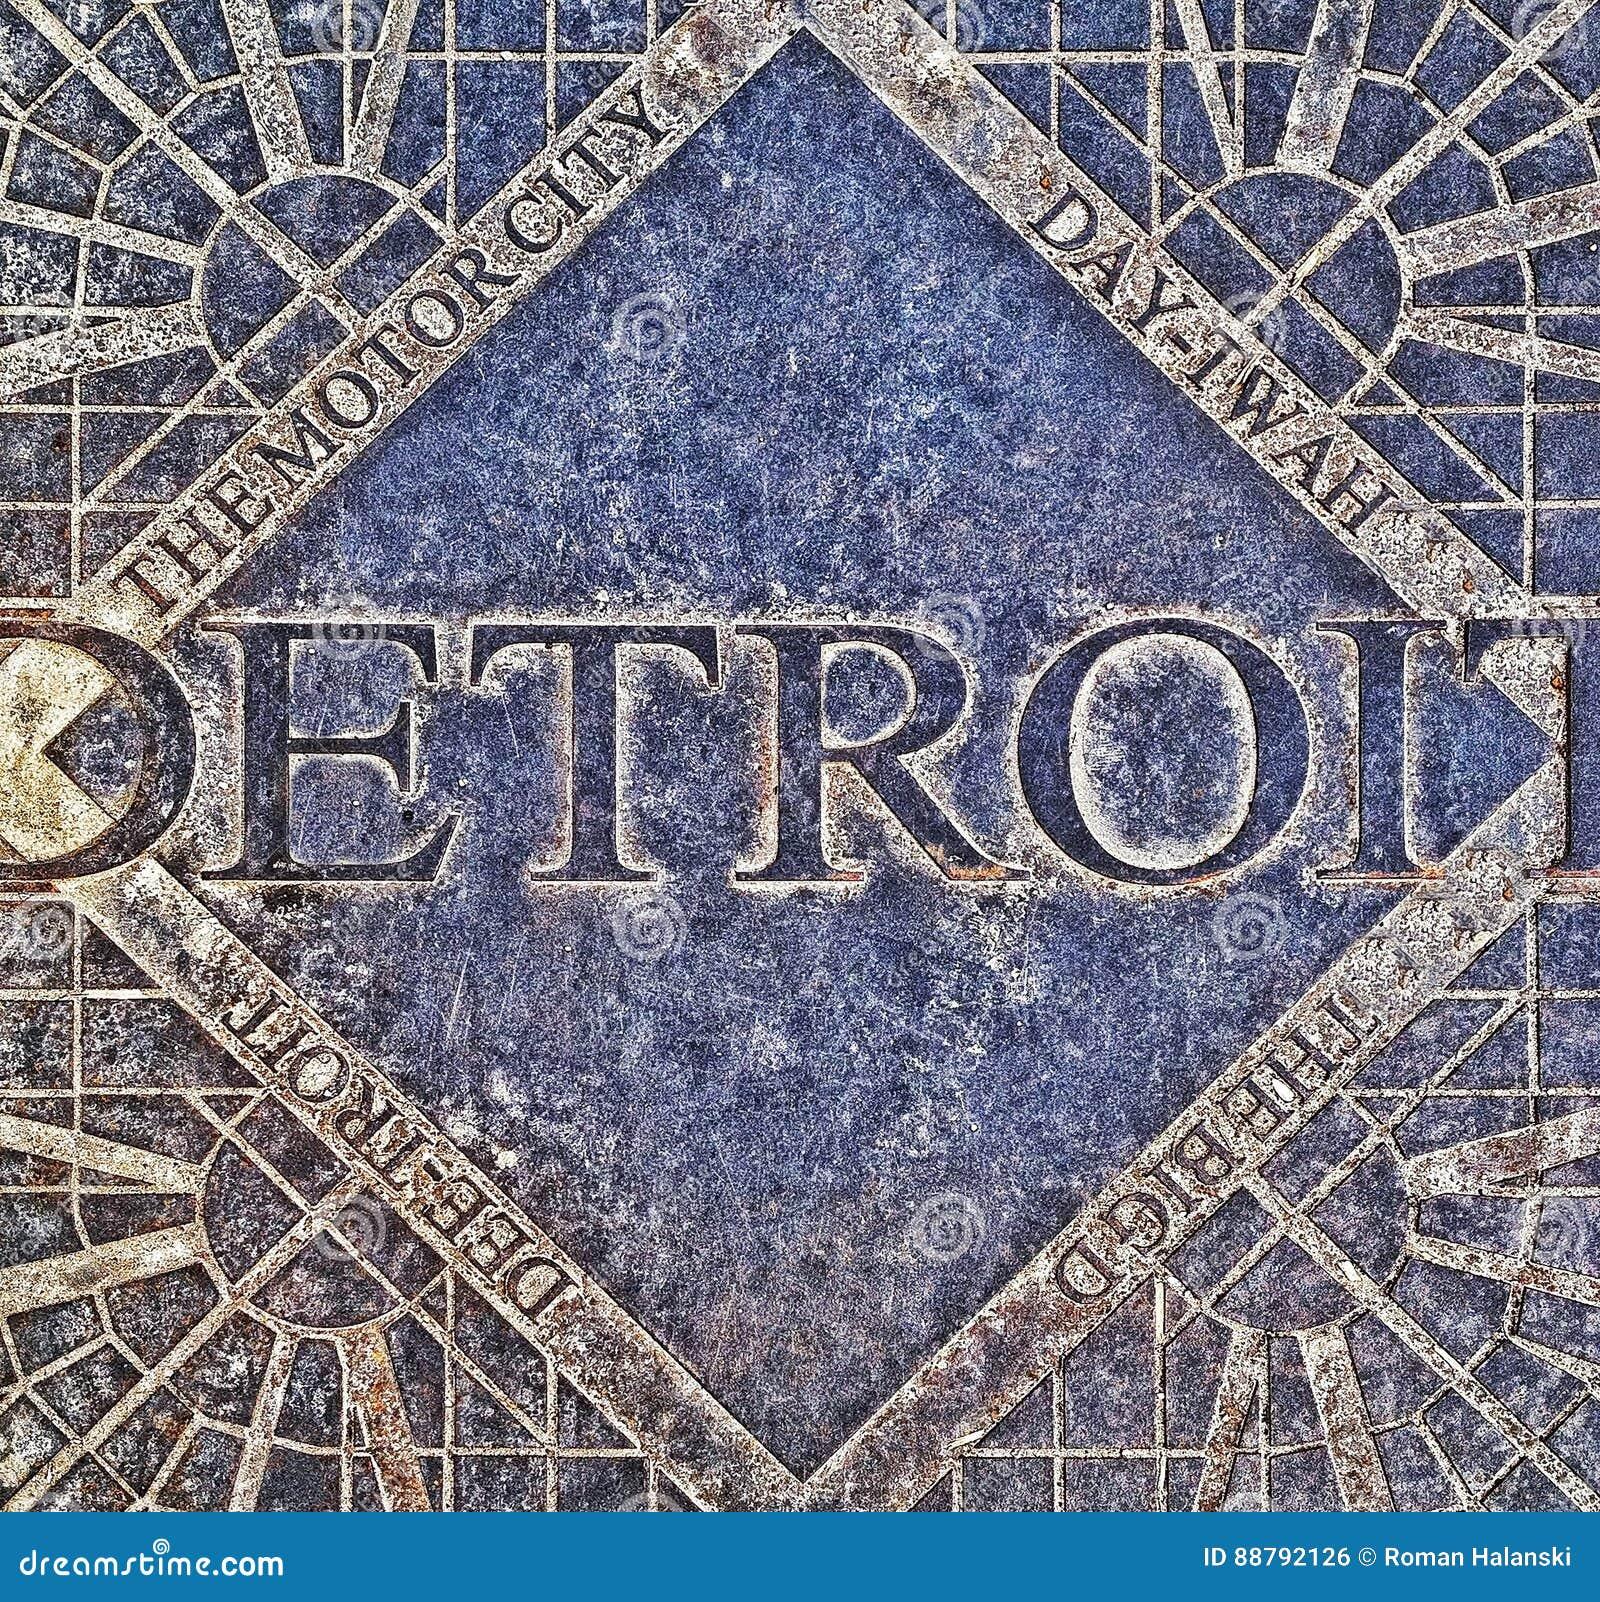 Tampa de câmara de visita de Detroit